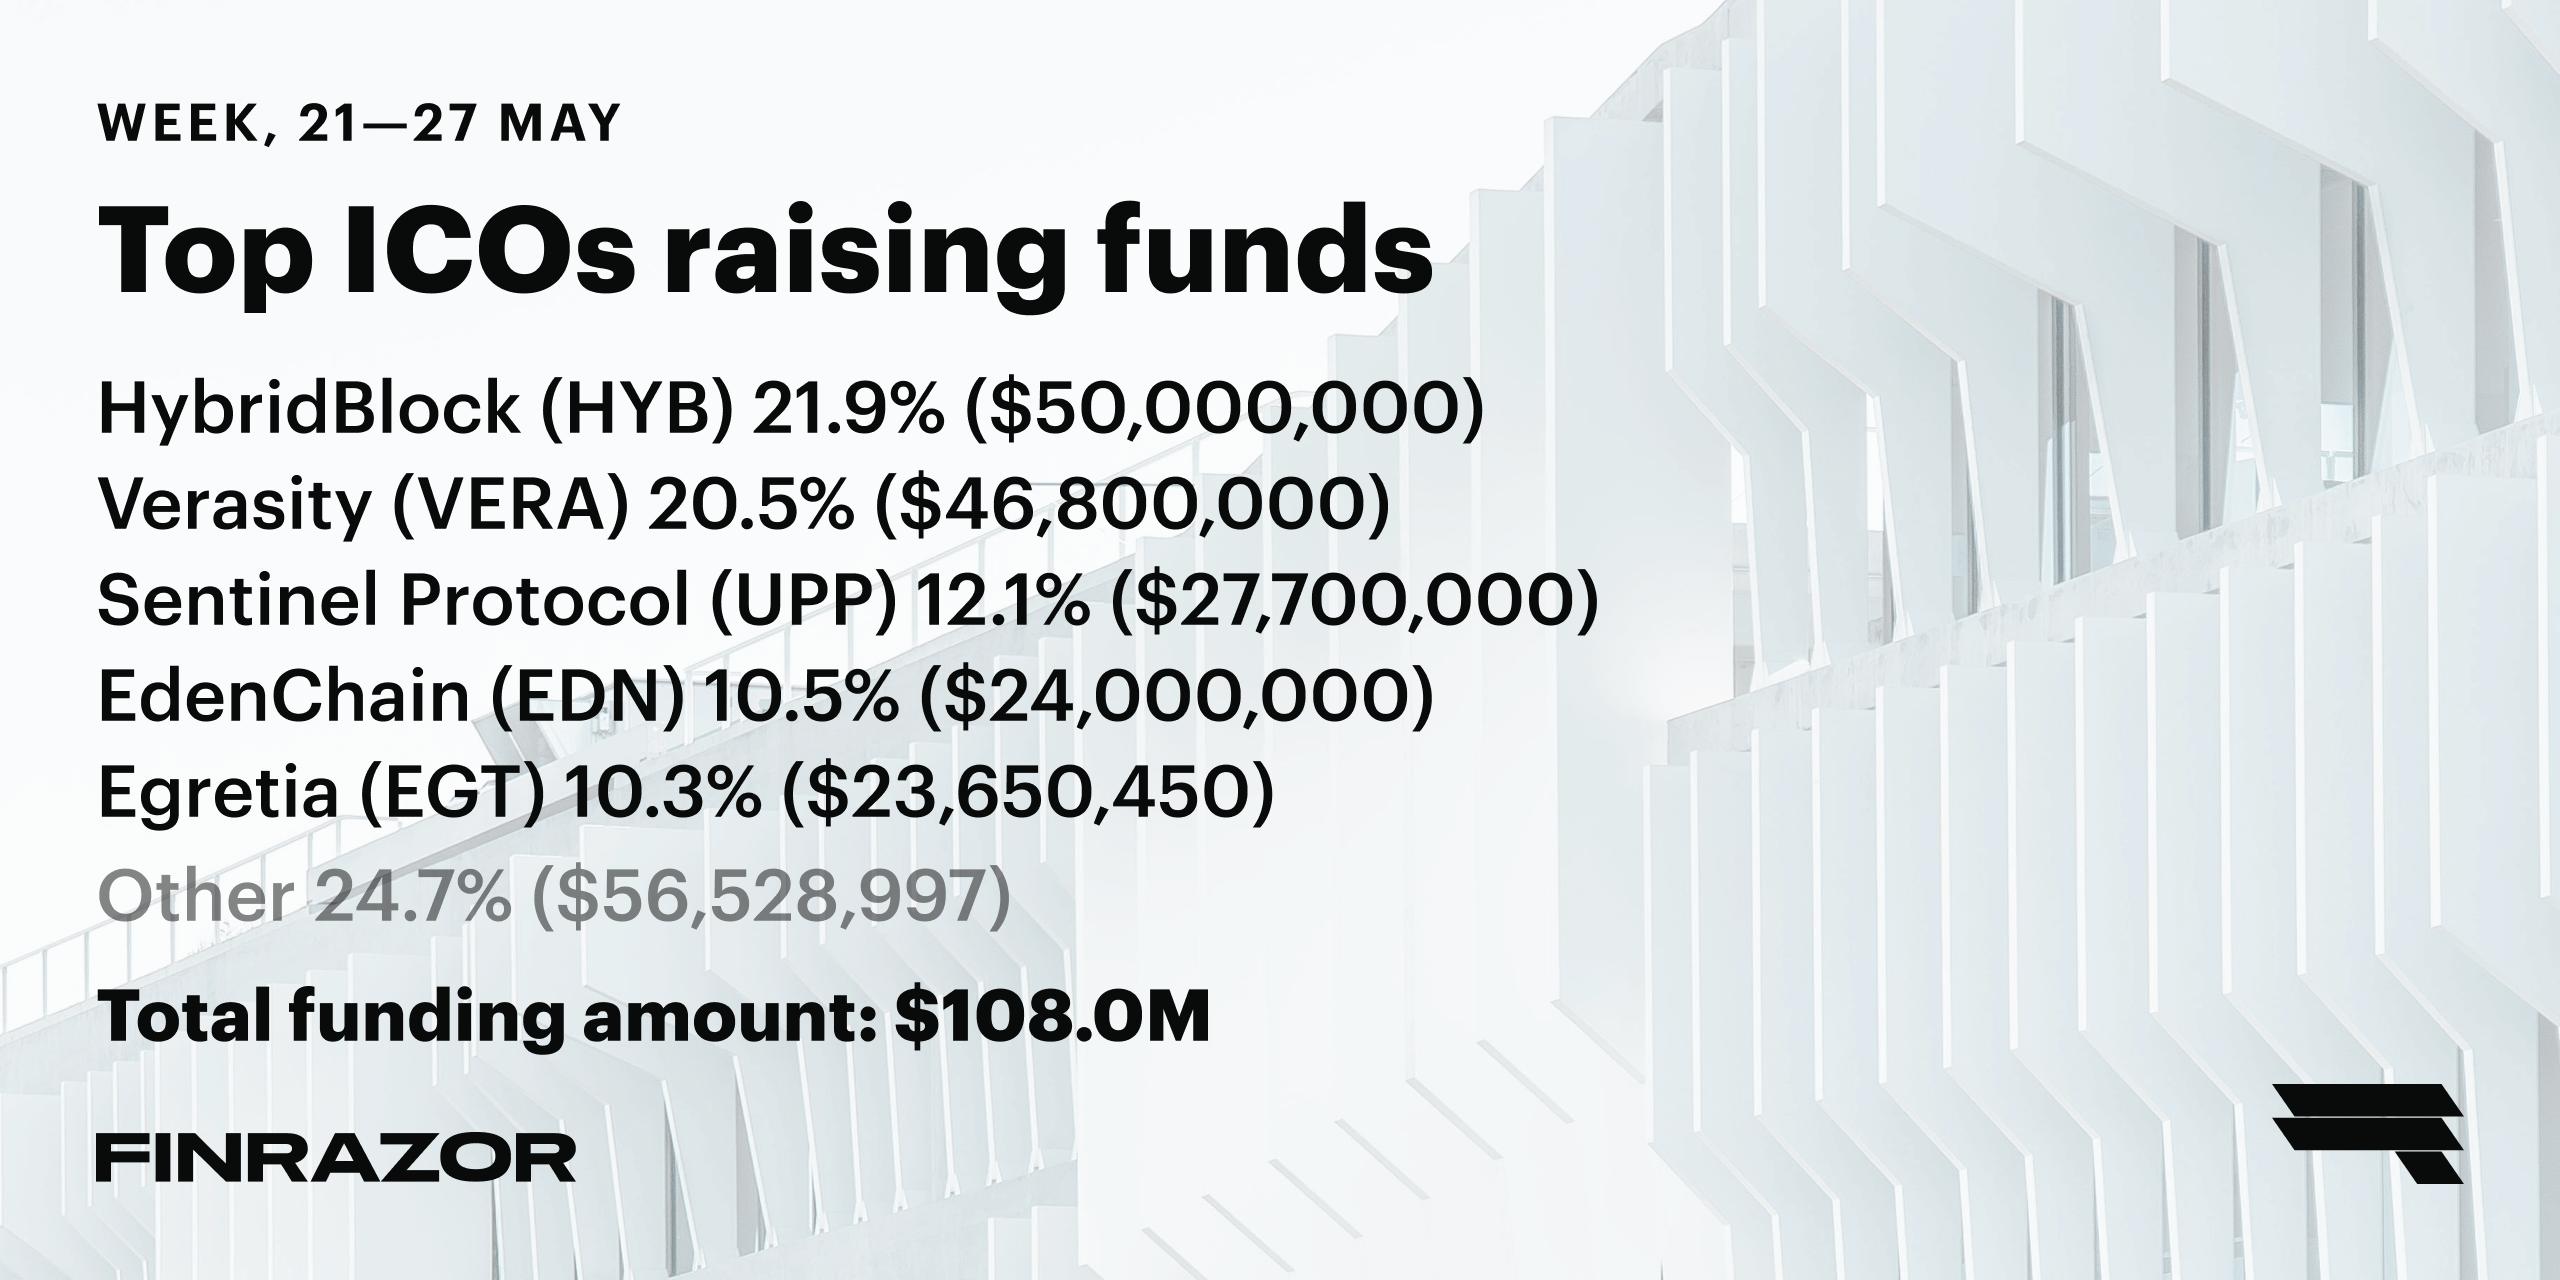 Top ICOs raising funds, Week 21 '18